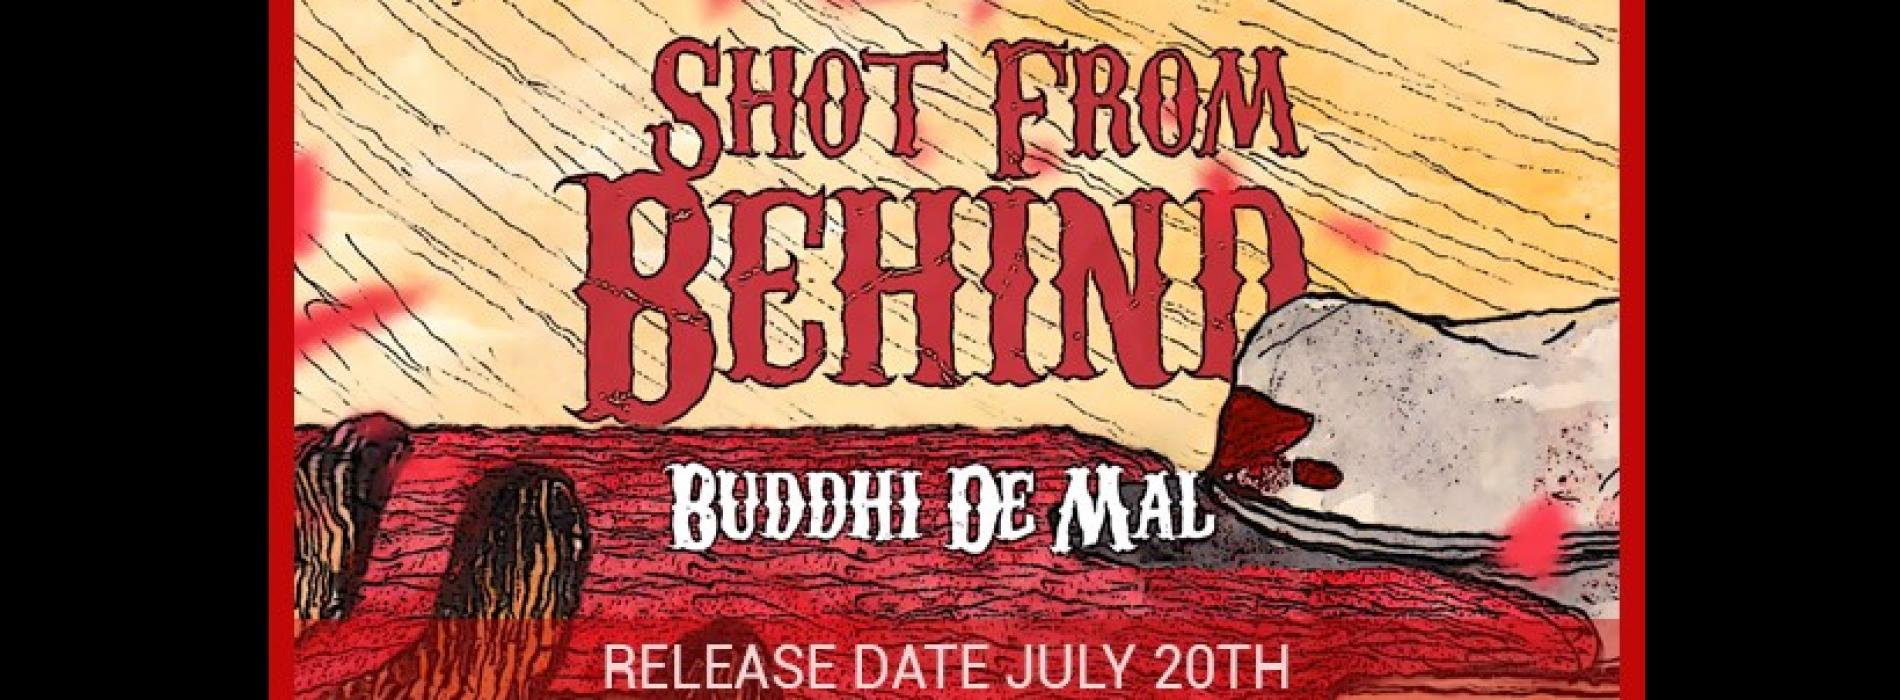 Buddhi De Mal Ft Elijah C Sinthaby – Shot From Behind